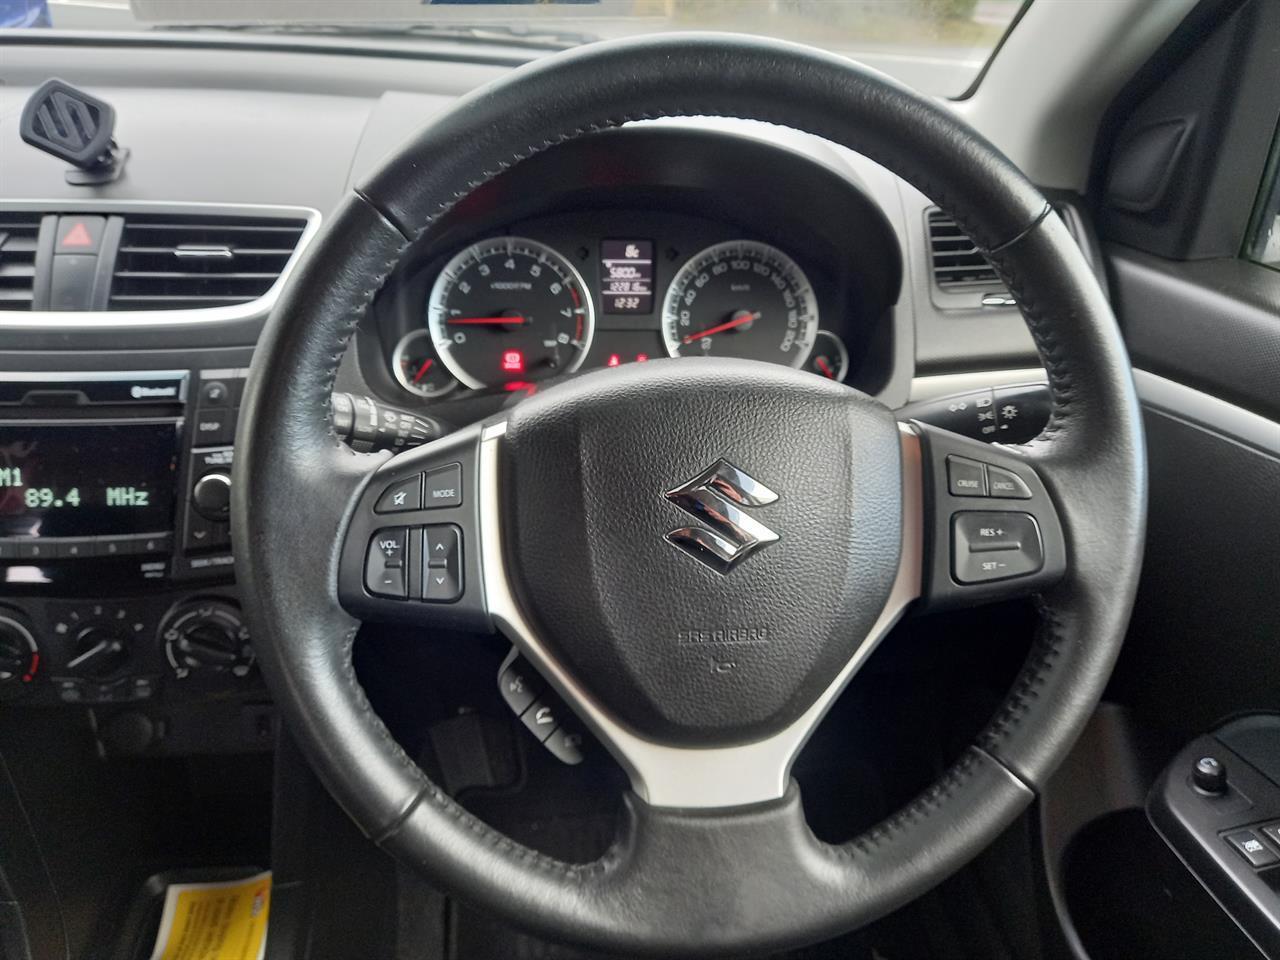 image-18, 2016 Suzuki Swift XS5 NZ New Manual at Dunedin